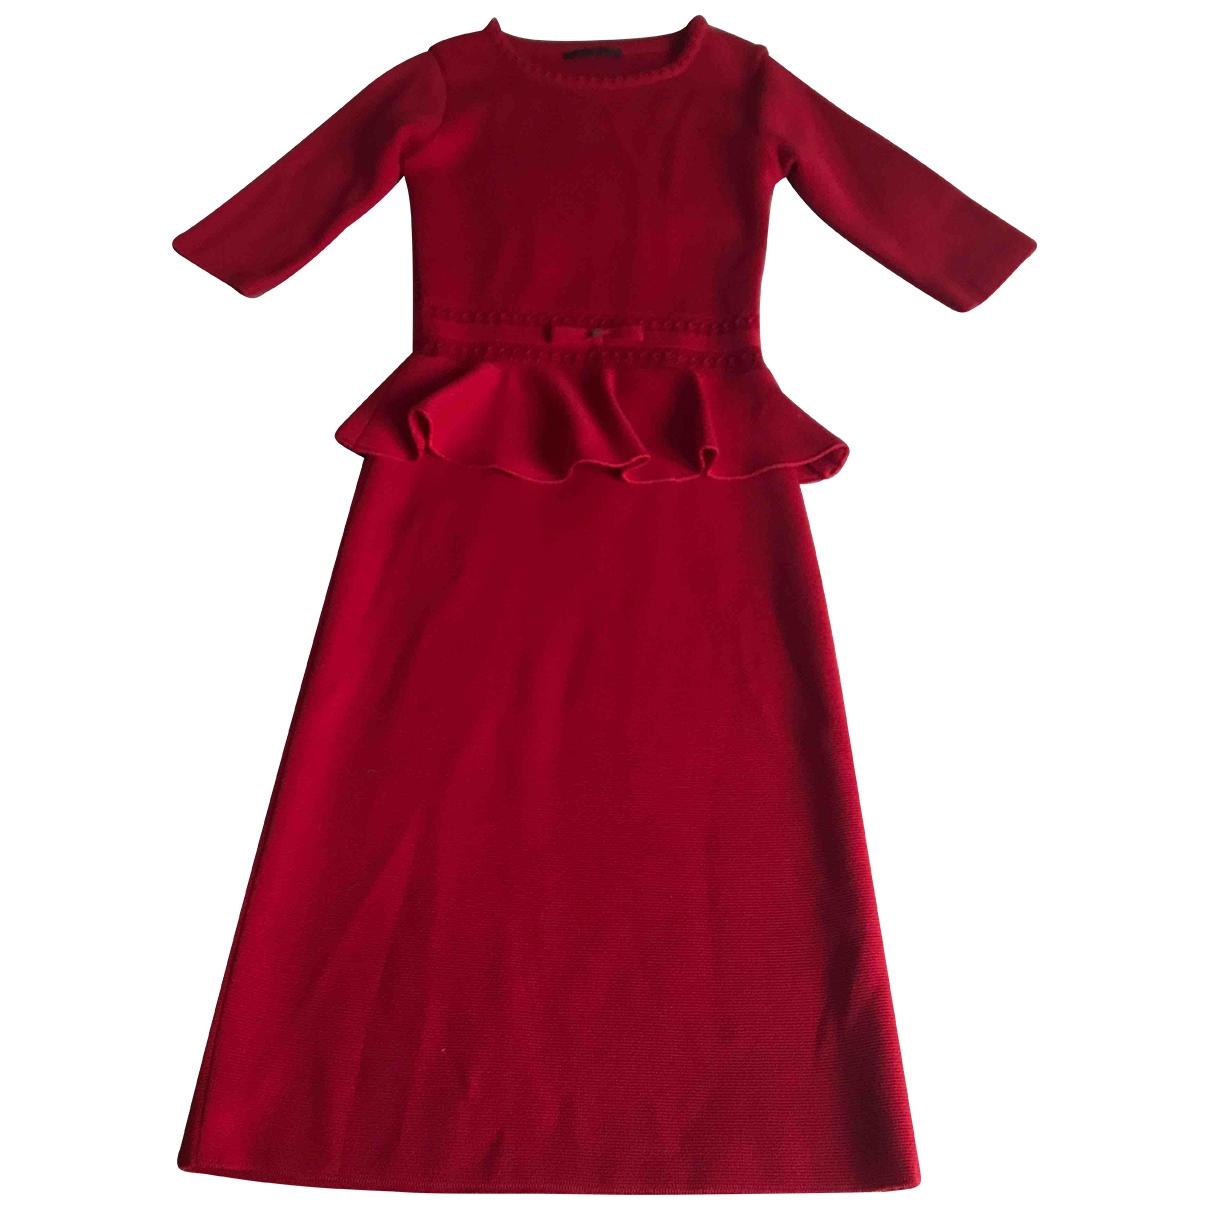 Carolina Herrera \N Red Wool dress for Women 34 FR